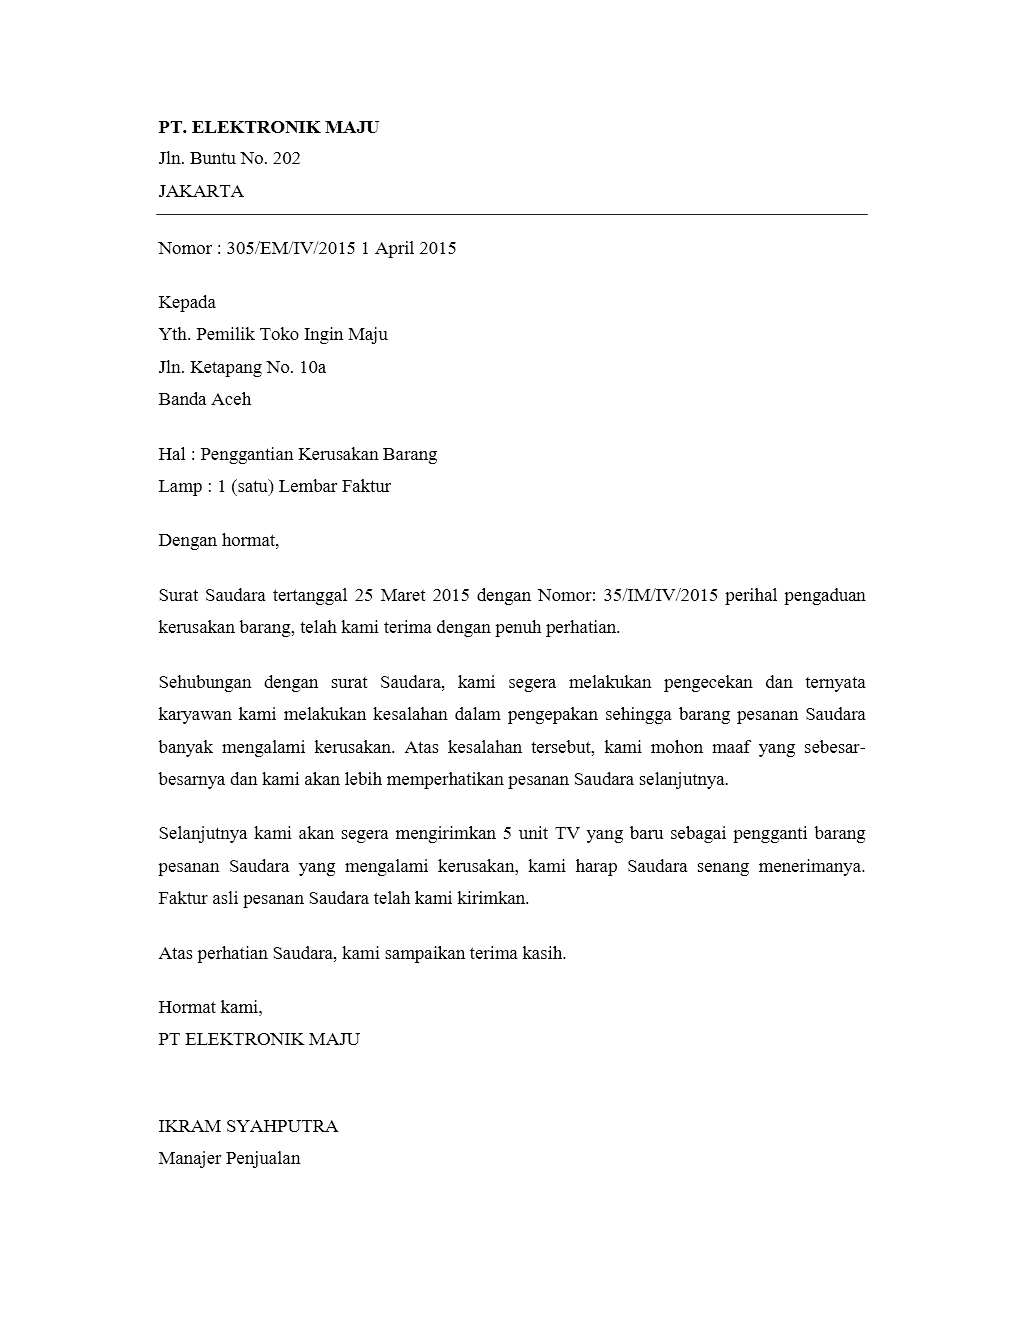 Contoh Surat Jawaban Pengaduan Untuk Pembeli Contoh Surat Org